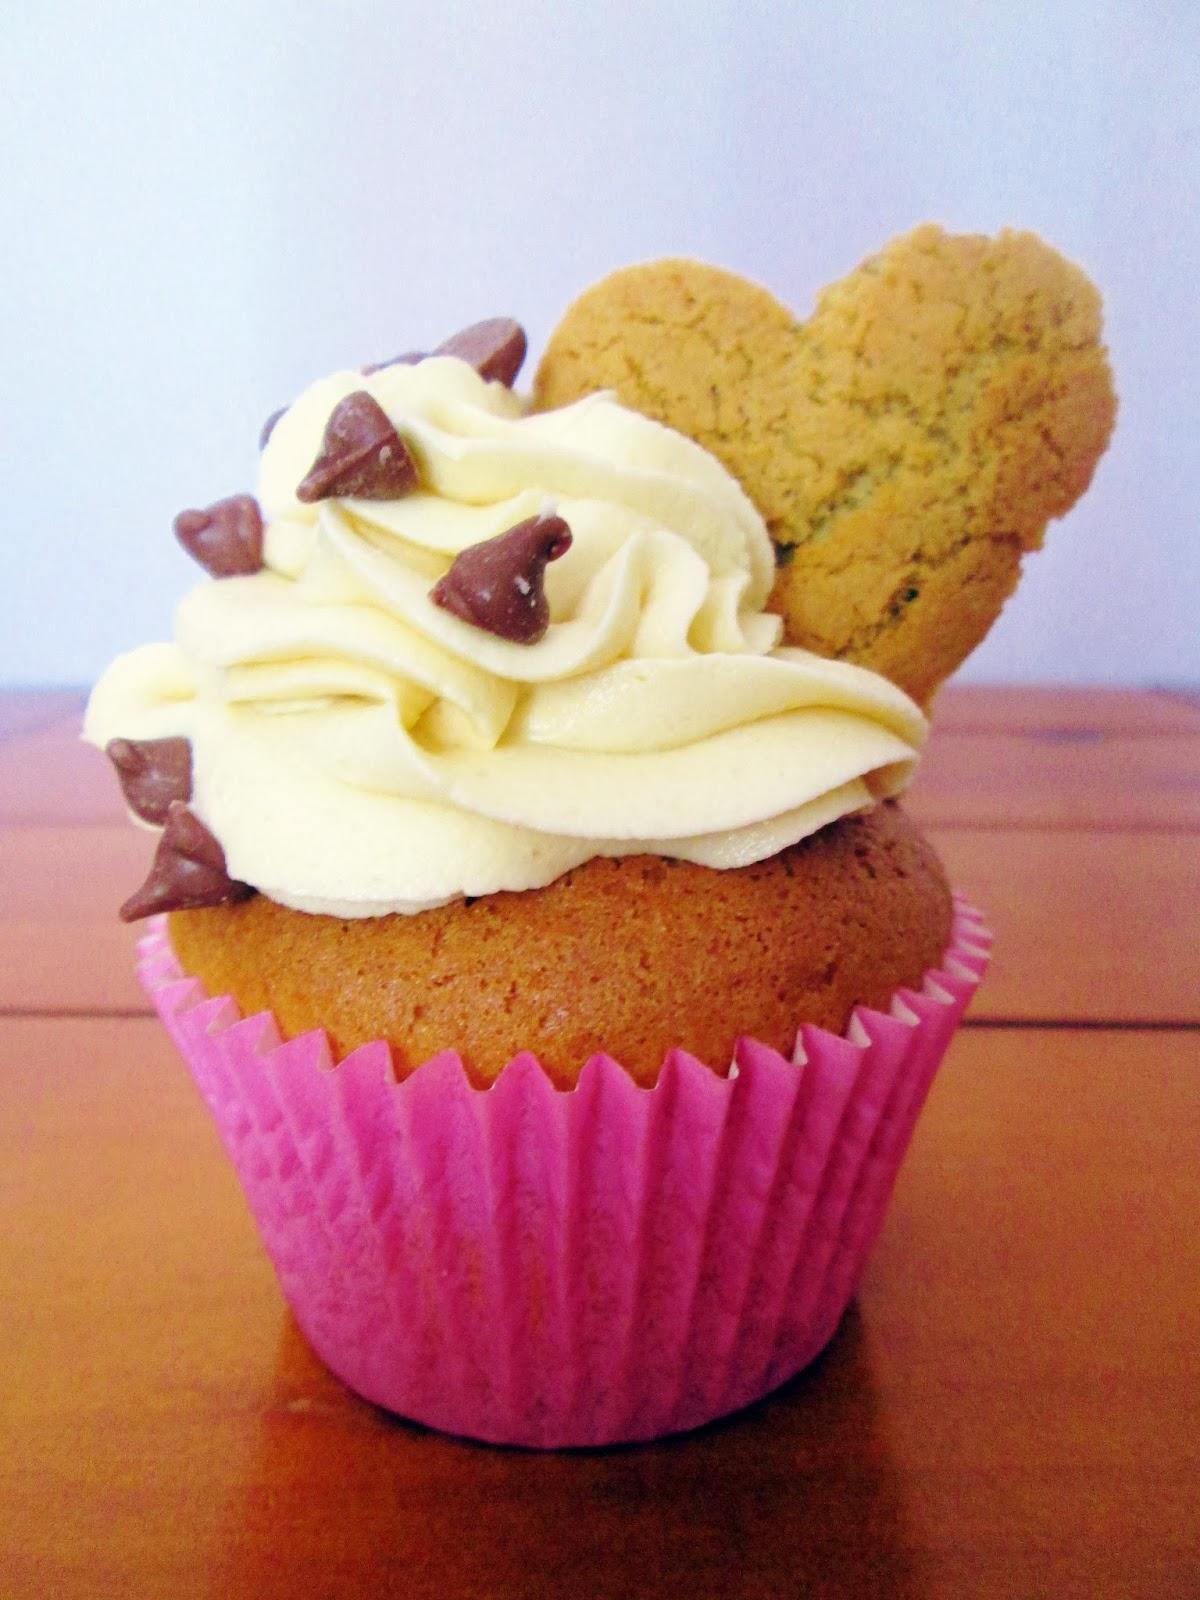 http://themessykitchenuk.blogspot.co.uk/2014/02/cookie-stuffed-cupcakes.html